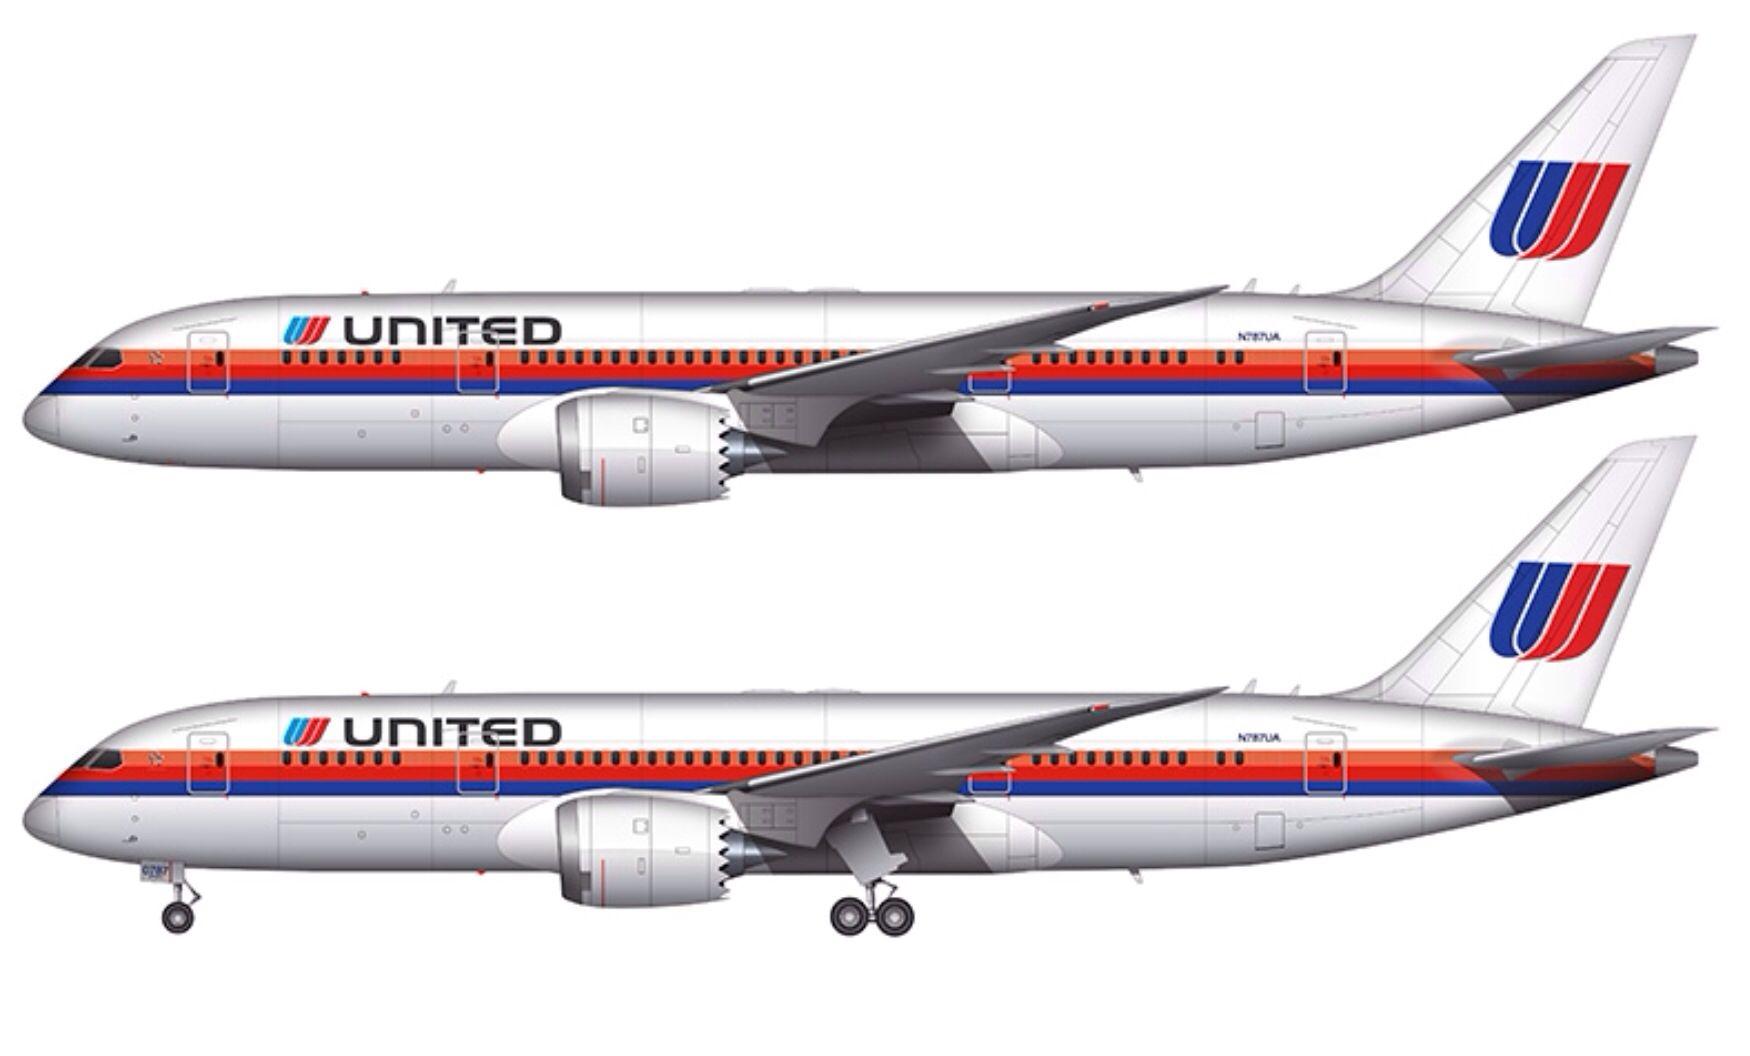 Retro 70's united Airlines logo/ 787 United airlines